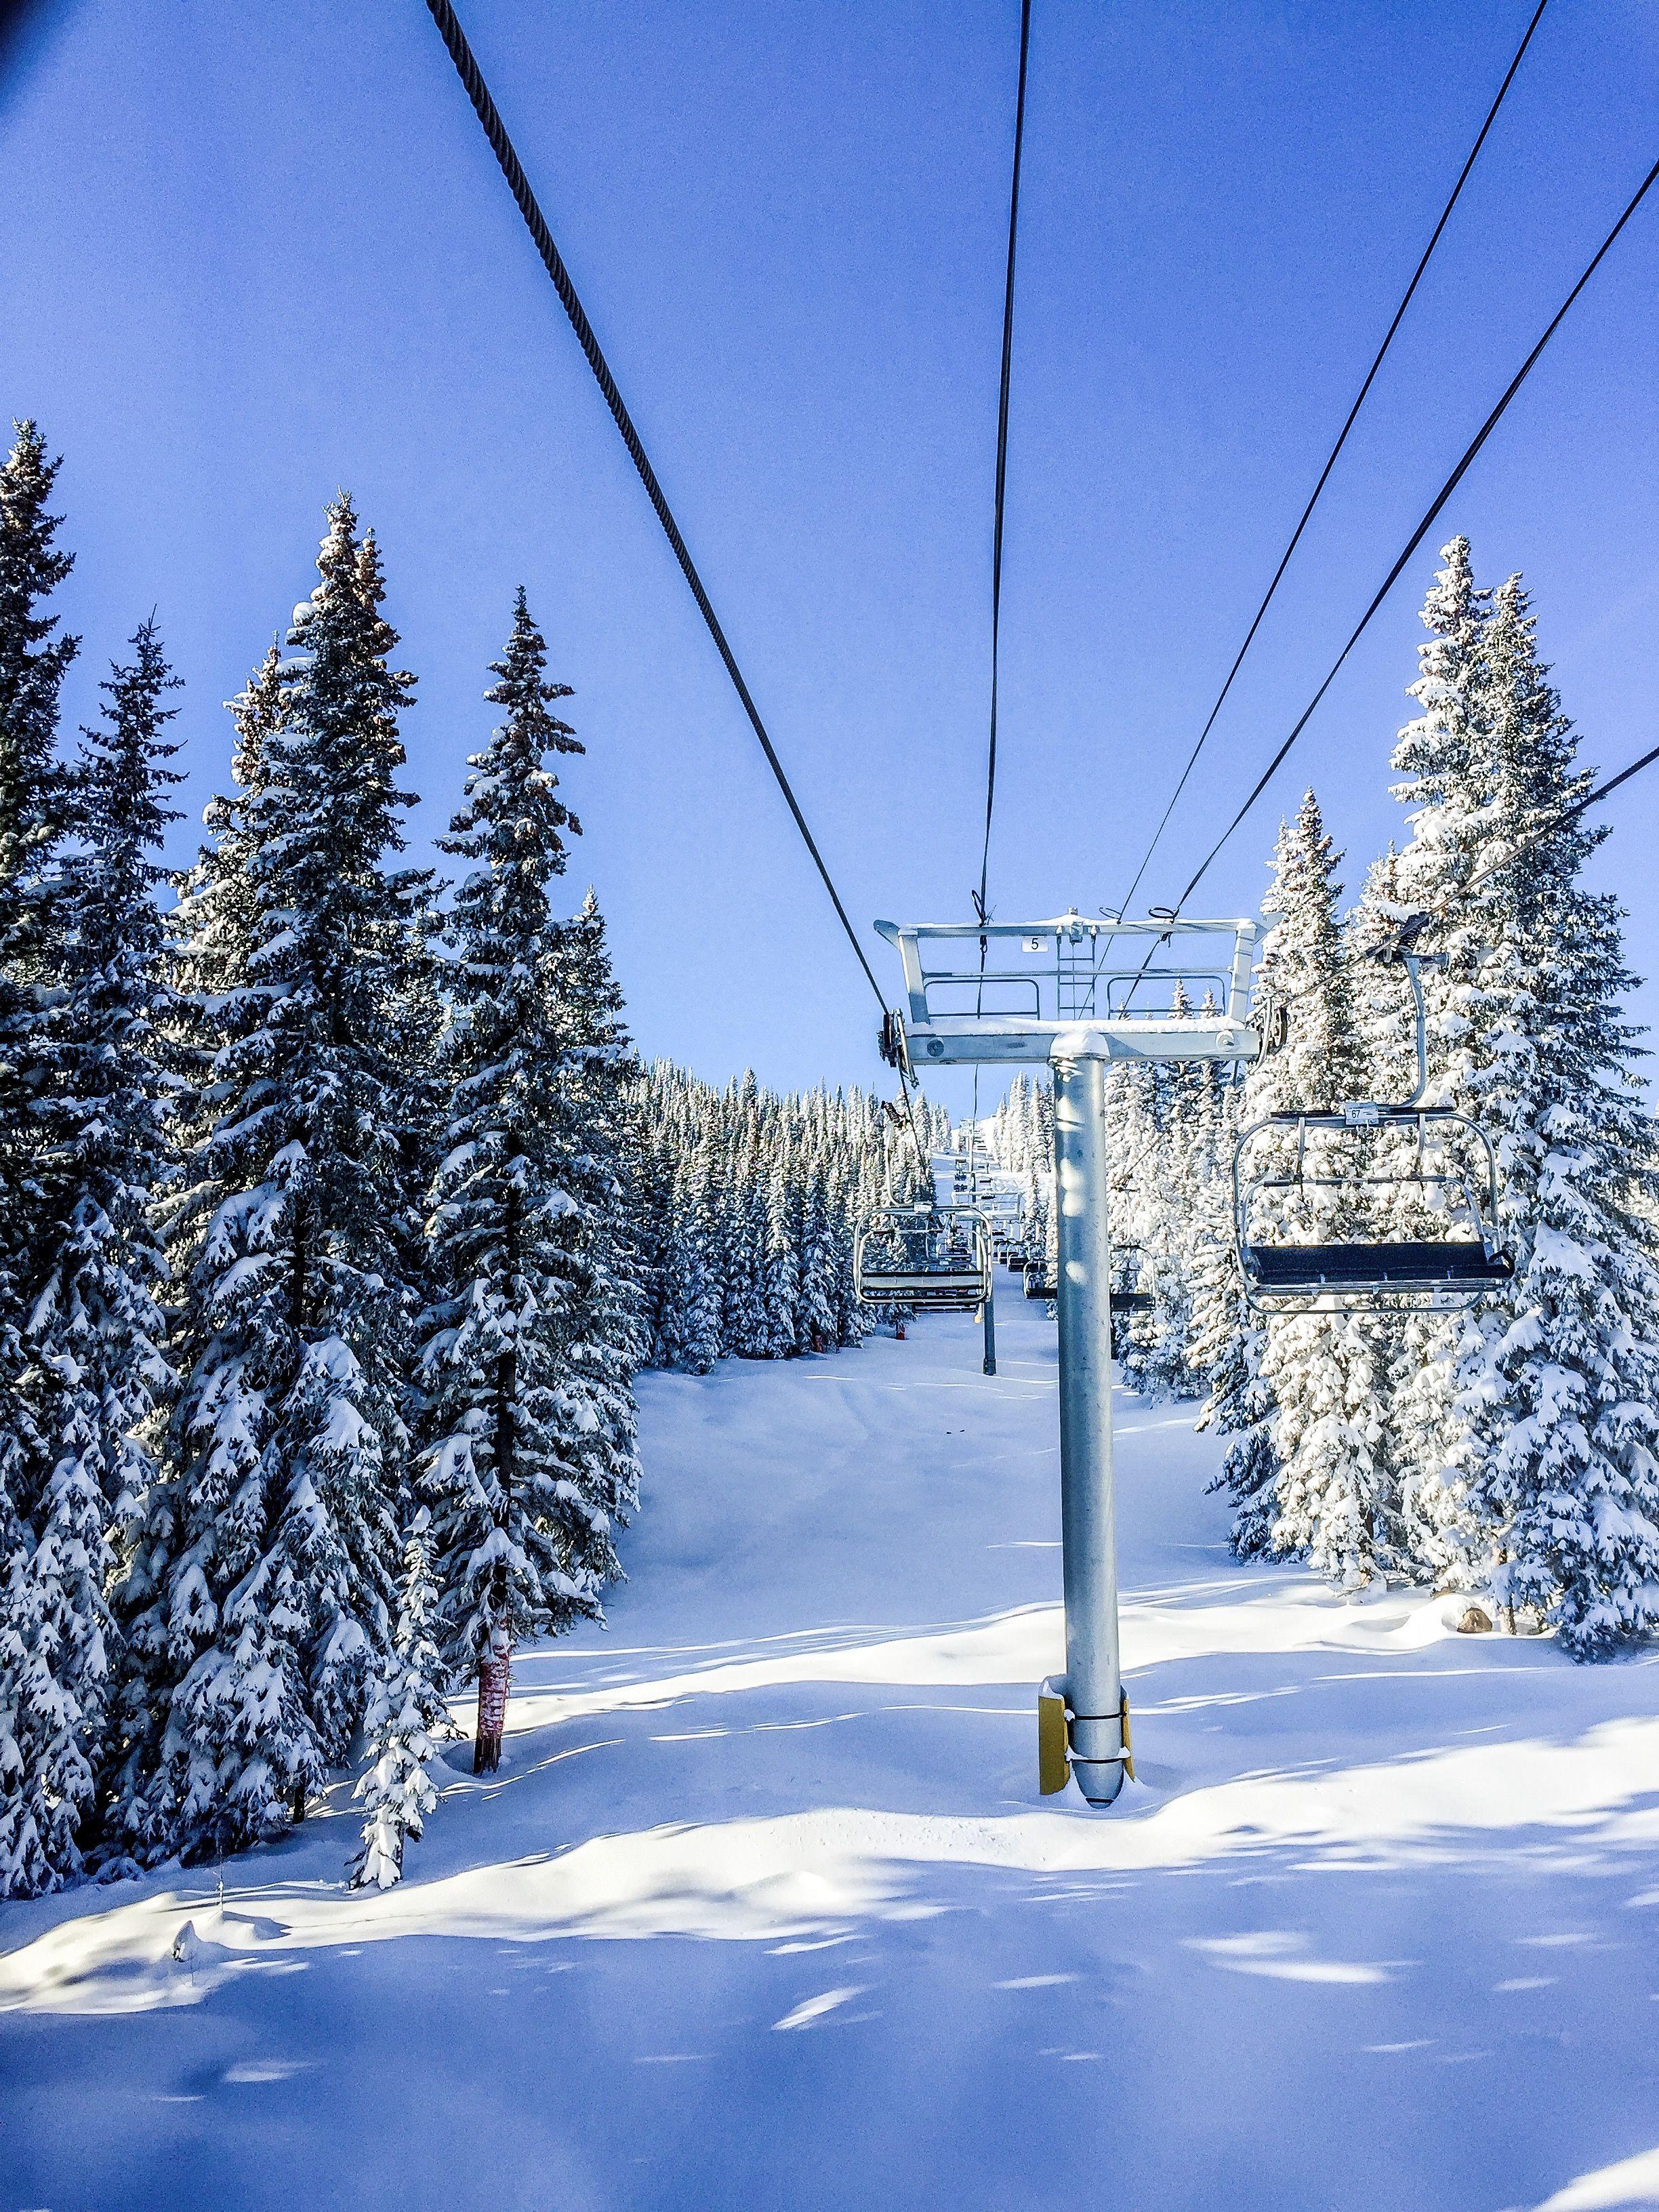 Chair lift at marmot basin winter adventure ski trails